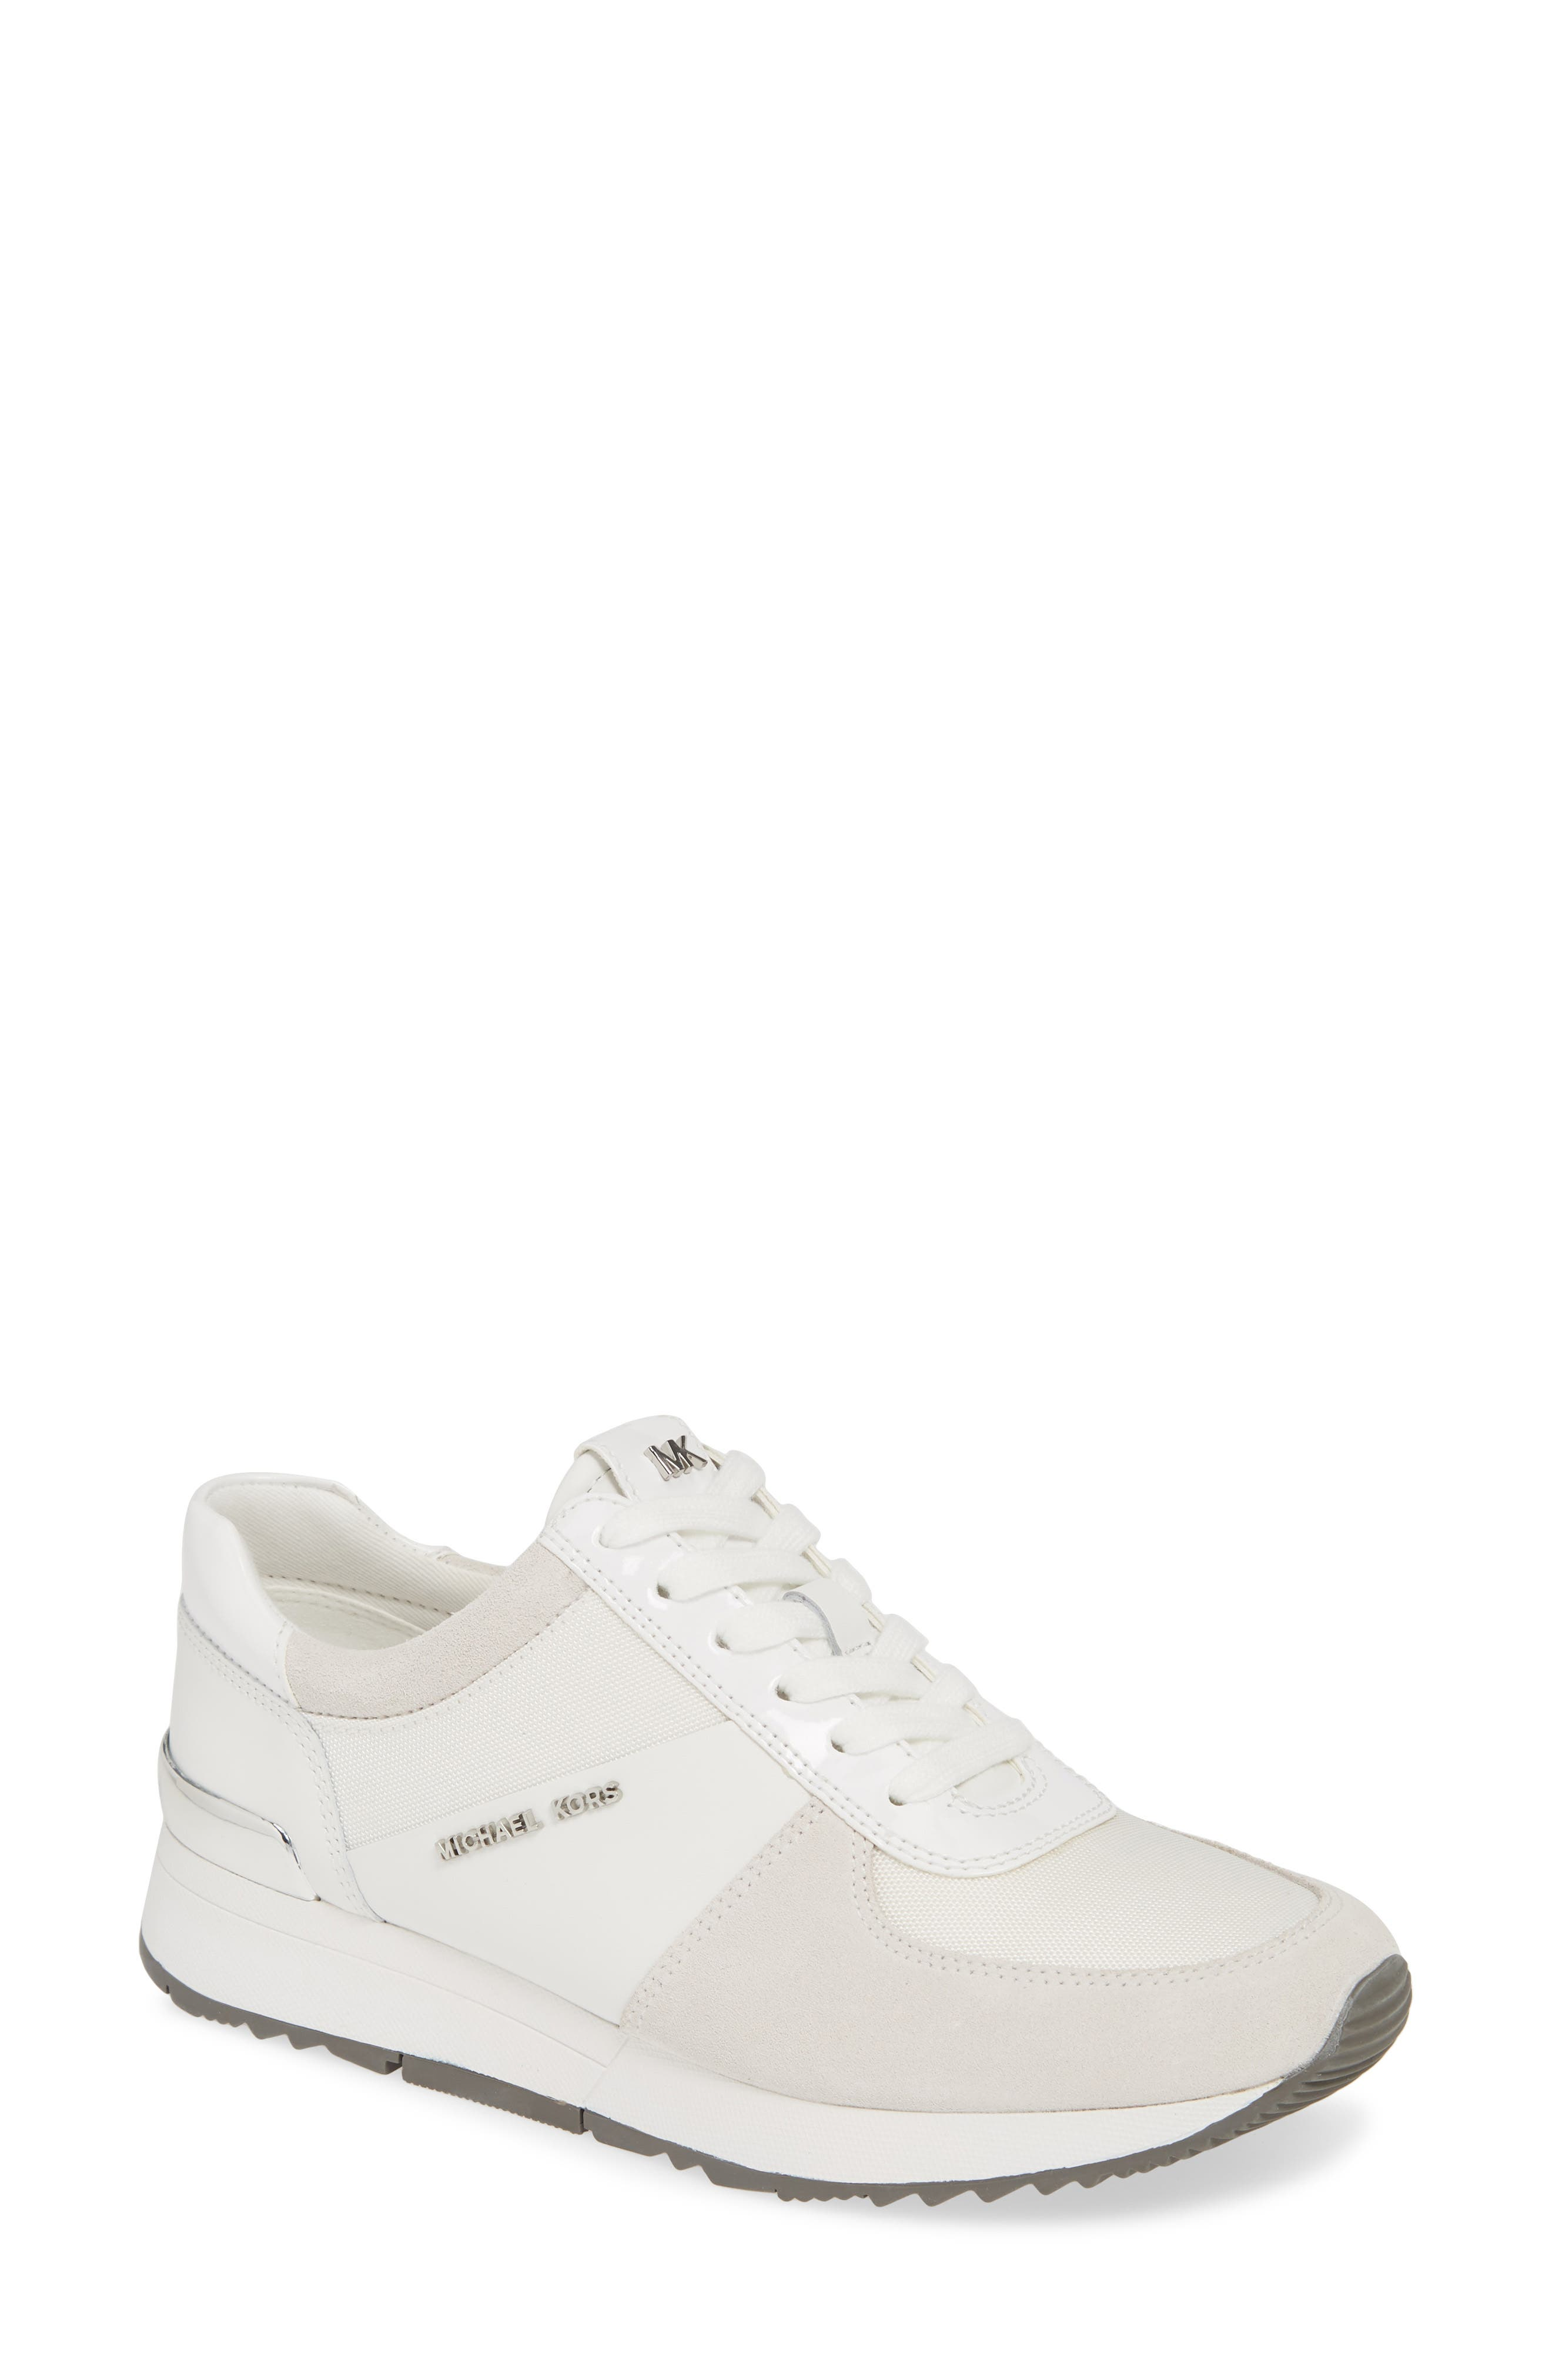 MICHAEL MICHAEL KORS 'Allie' Sneaker, Main, color, OPTIC WHITE LEATHER/ CANVAS